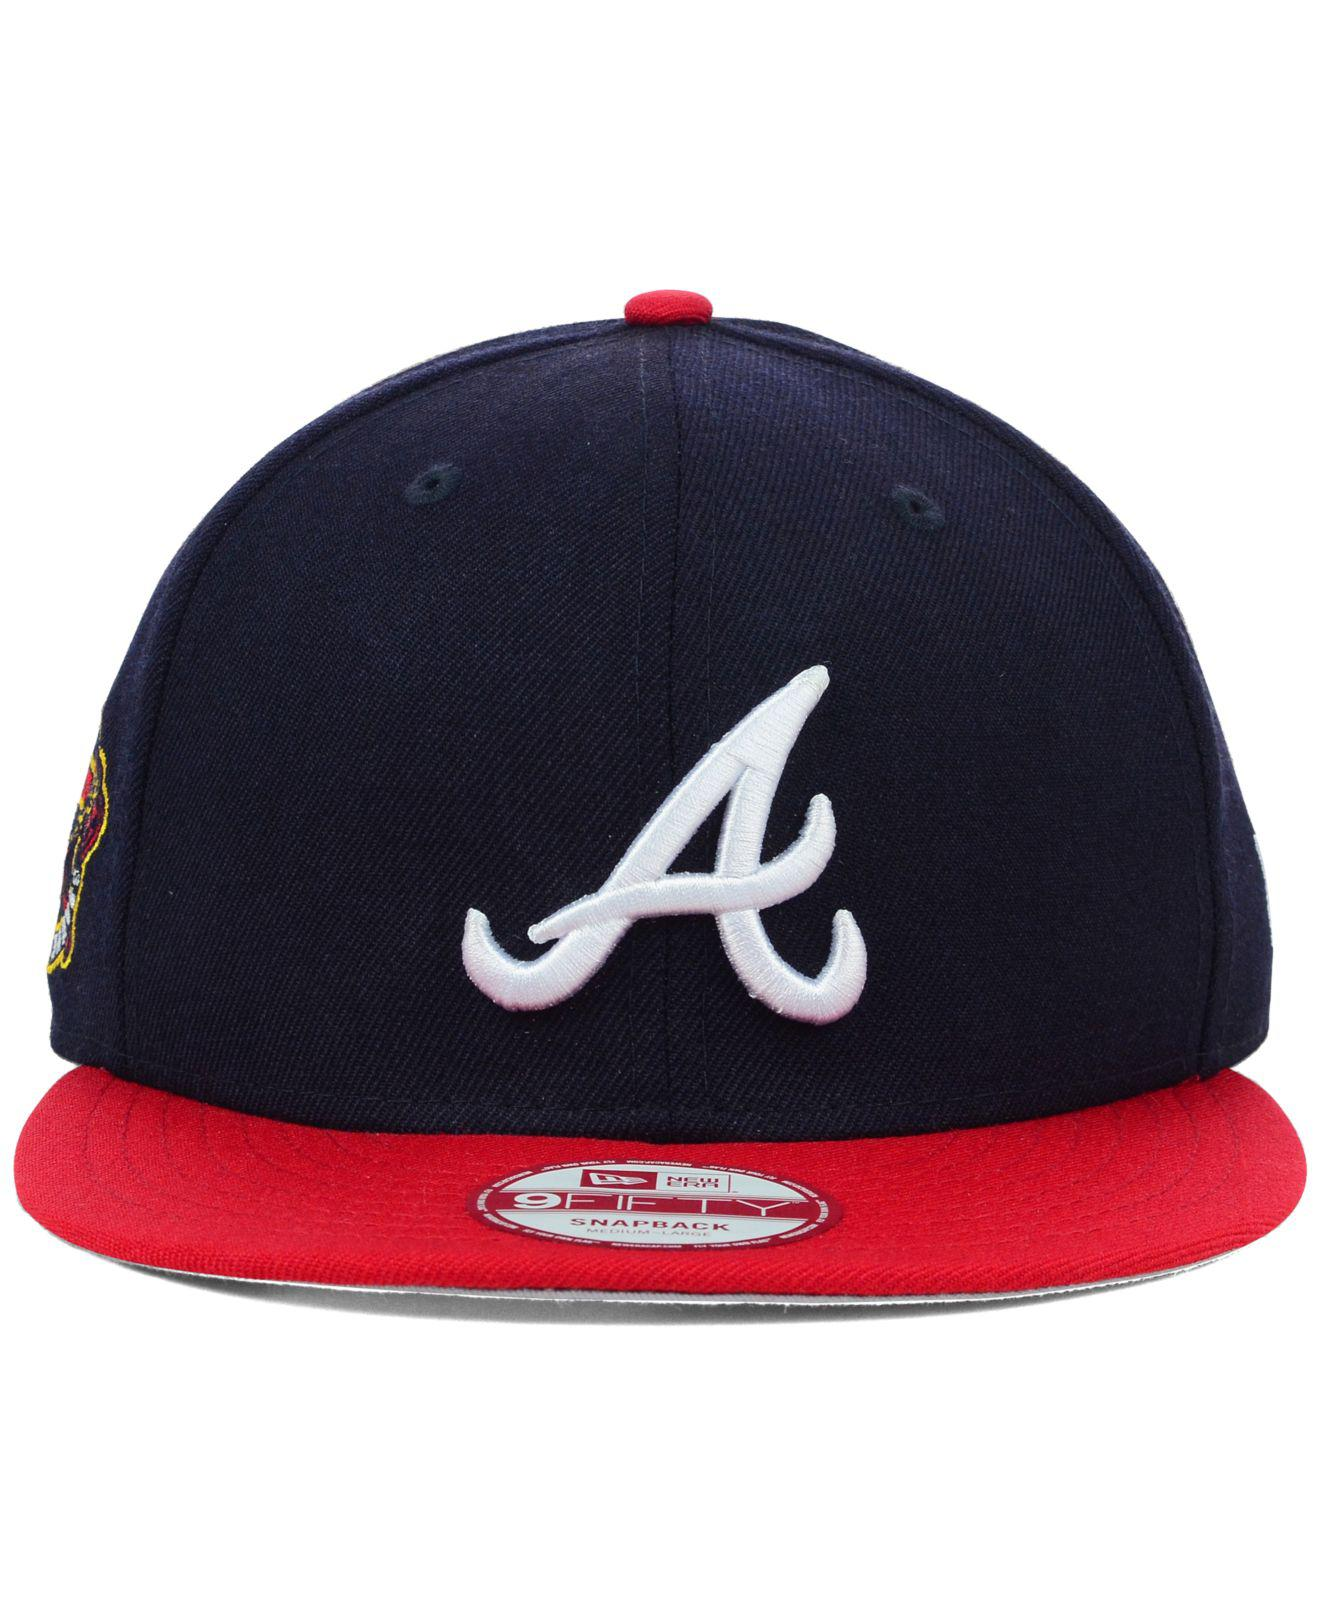 b2eda867b16 Lyst - KTZ Atlanta Braves Mlb 2 Tone Link 9fifty Snapback Cap in Blue for  Men